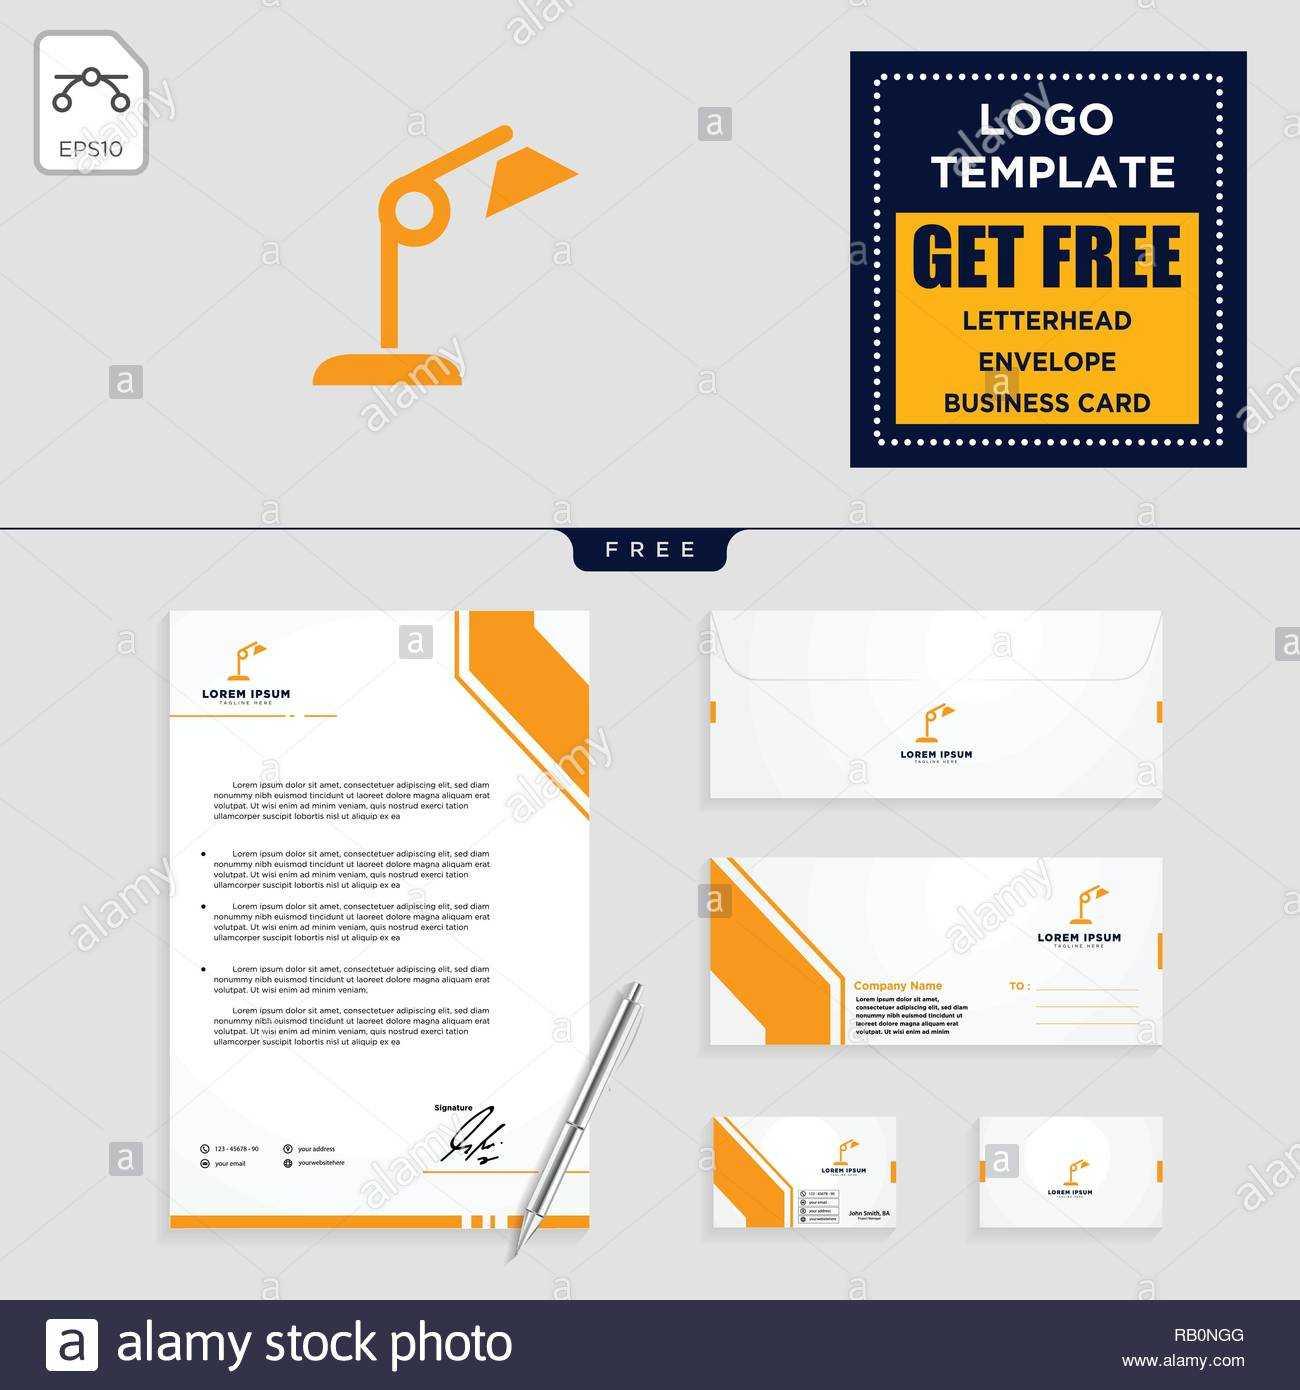 Light Interior Logo Template, Vector Illustration And intended for Business Card Letterhead Envelope Template